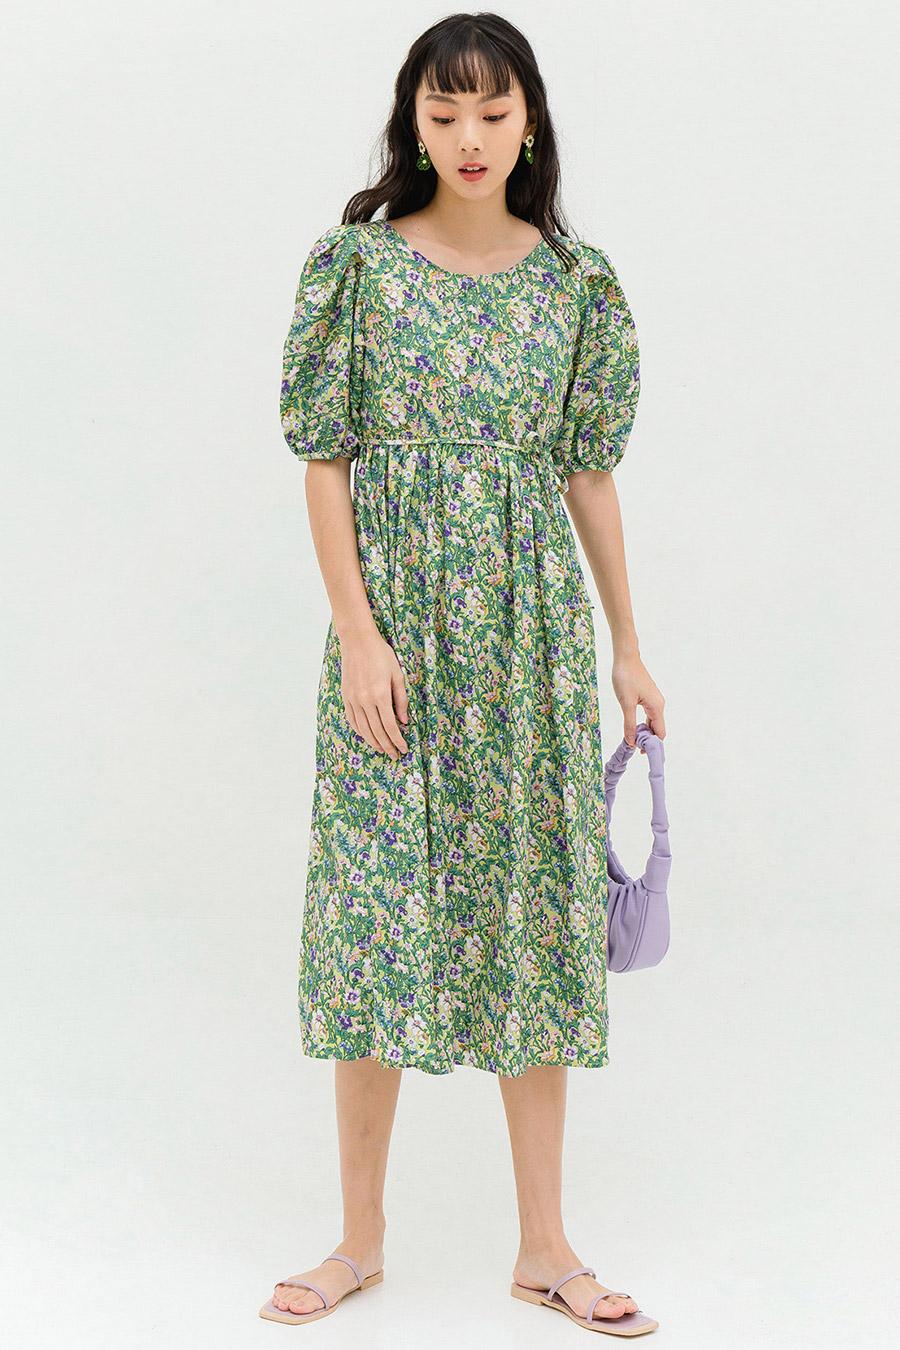 *RESTOCKED* SUEZANNE DRESS - VANILLA FLEUR